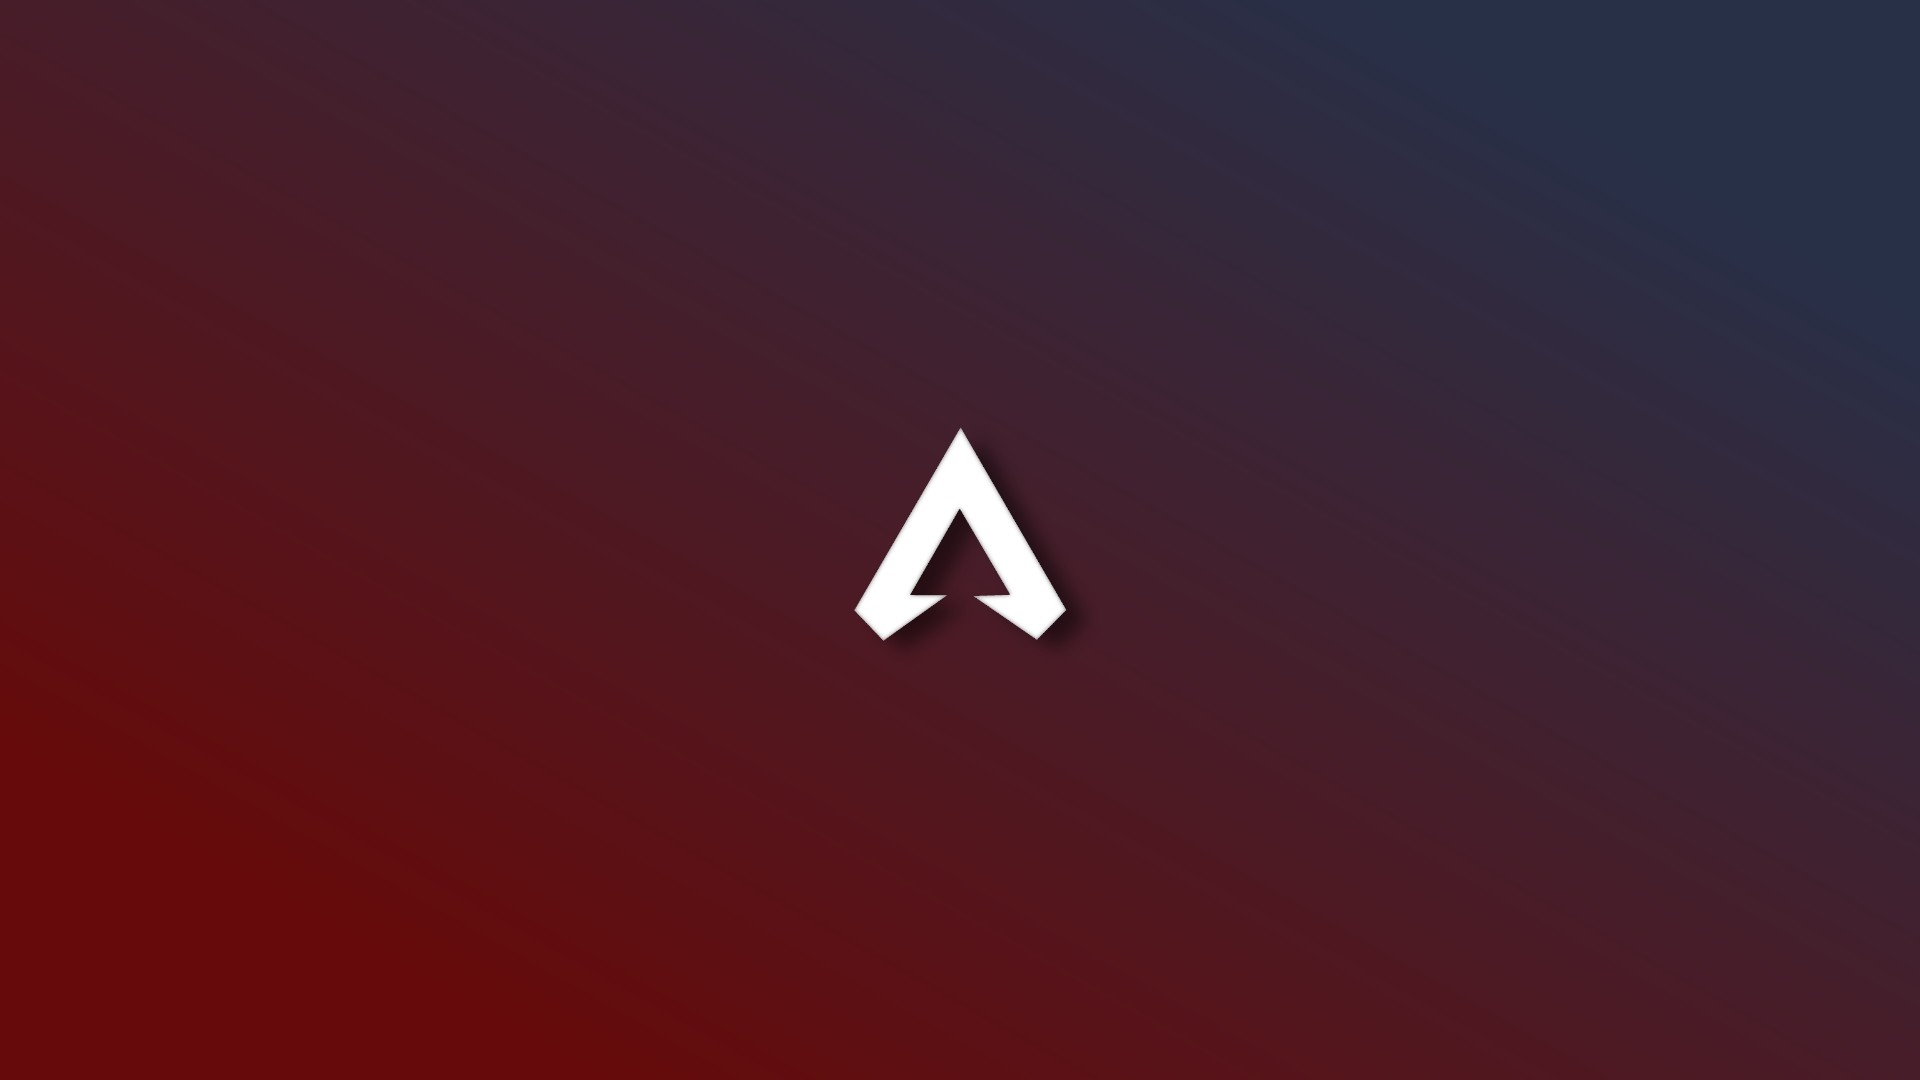 Apex HD Wallpaper